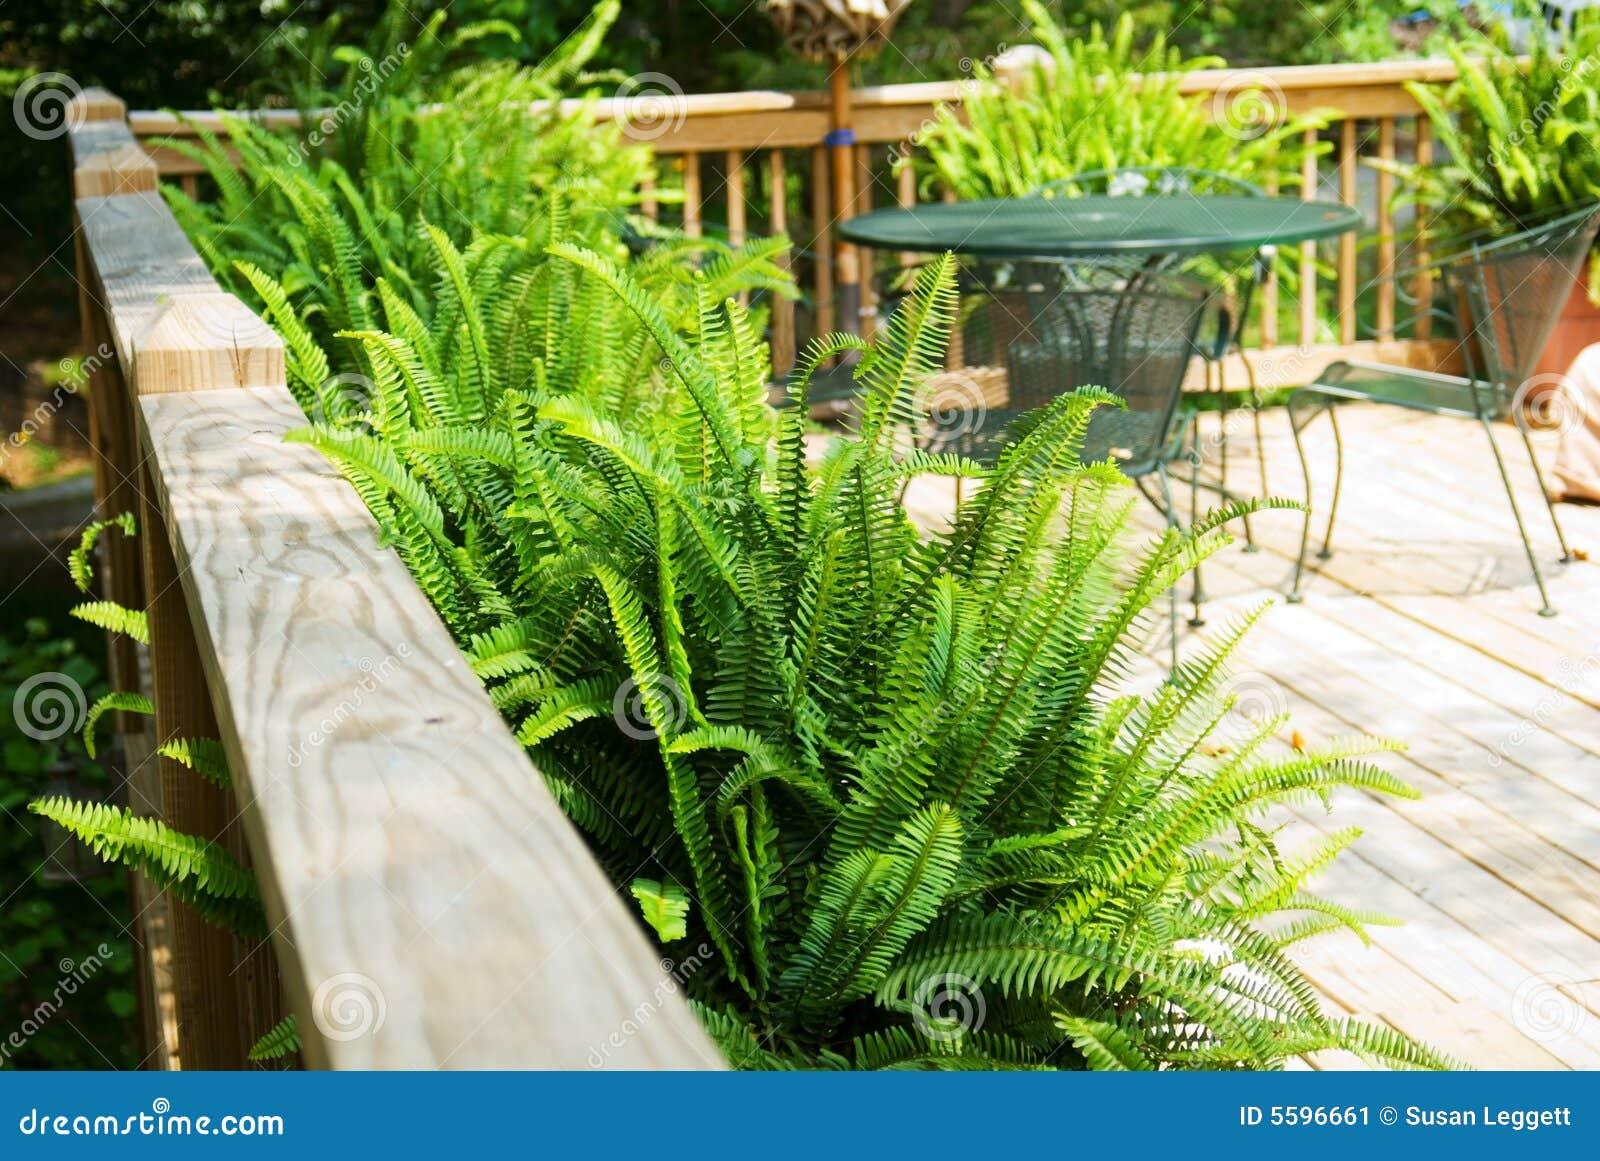 Wood Deck with Ferns